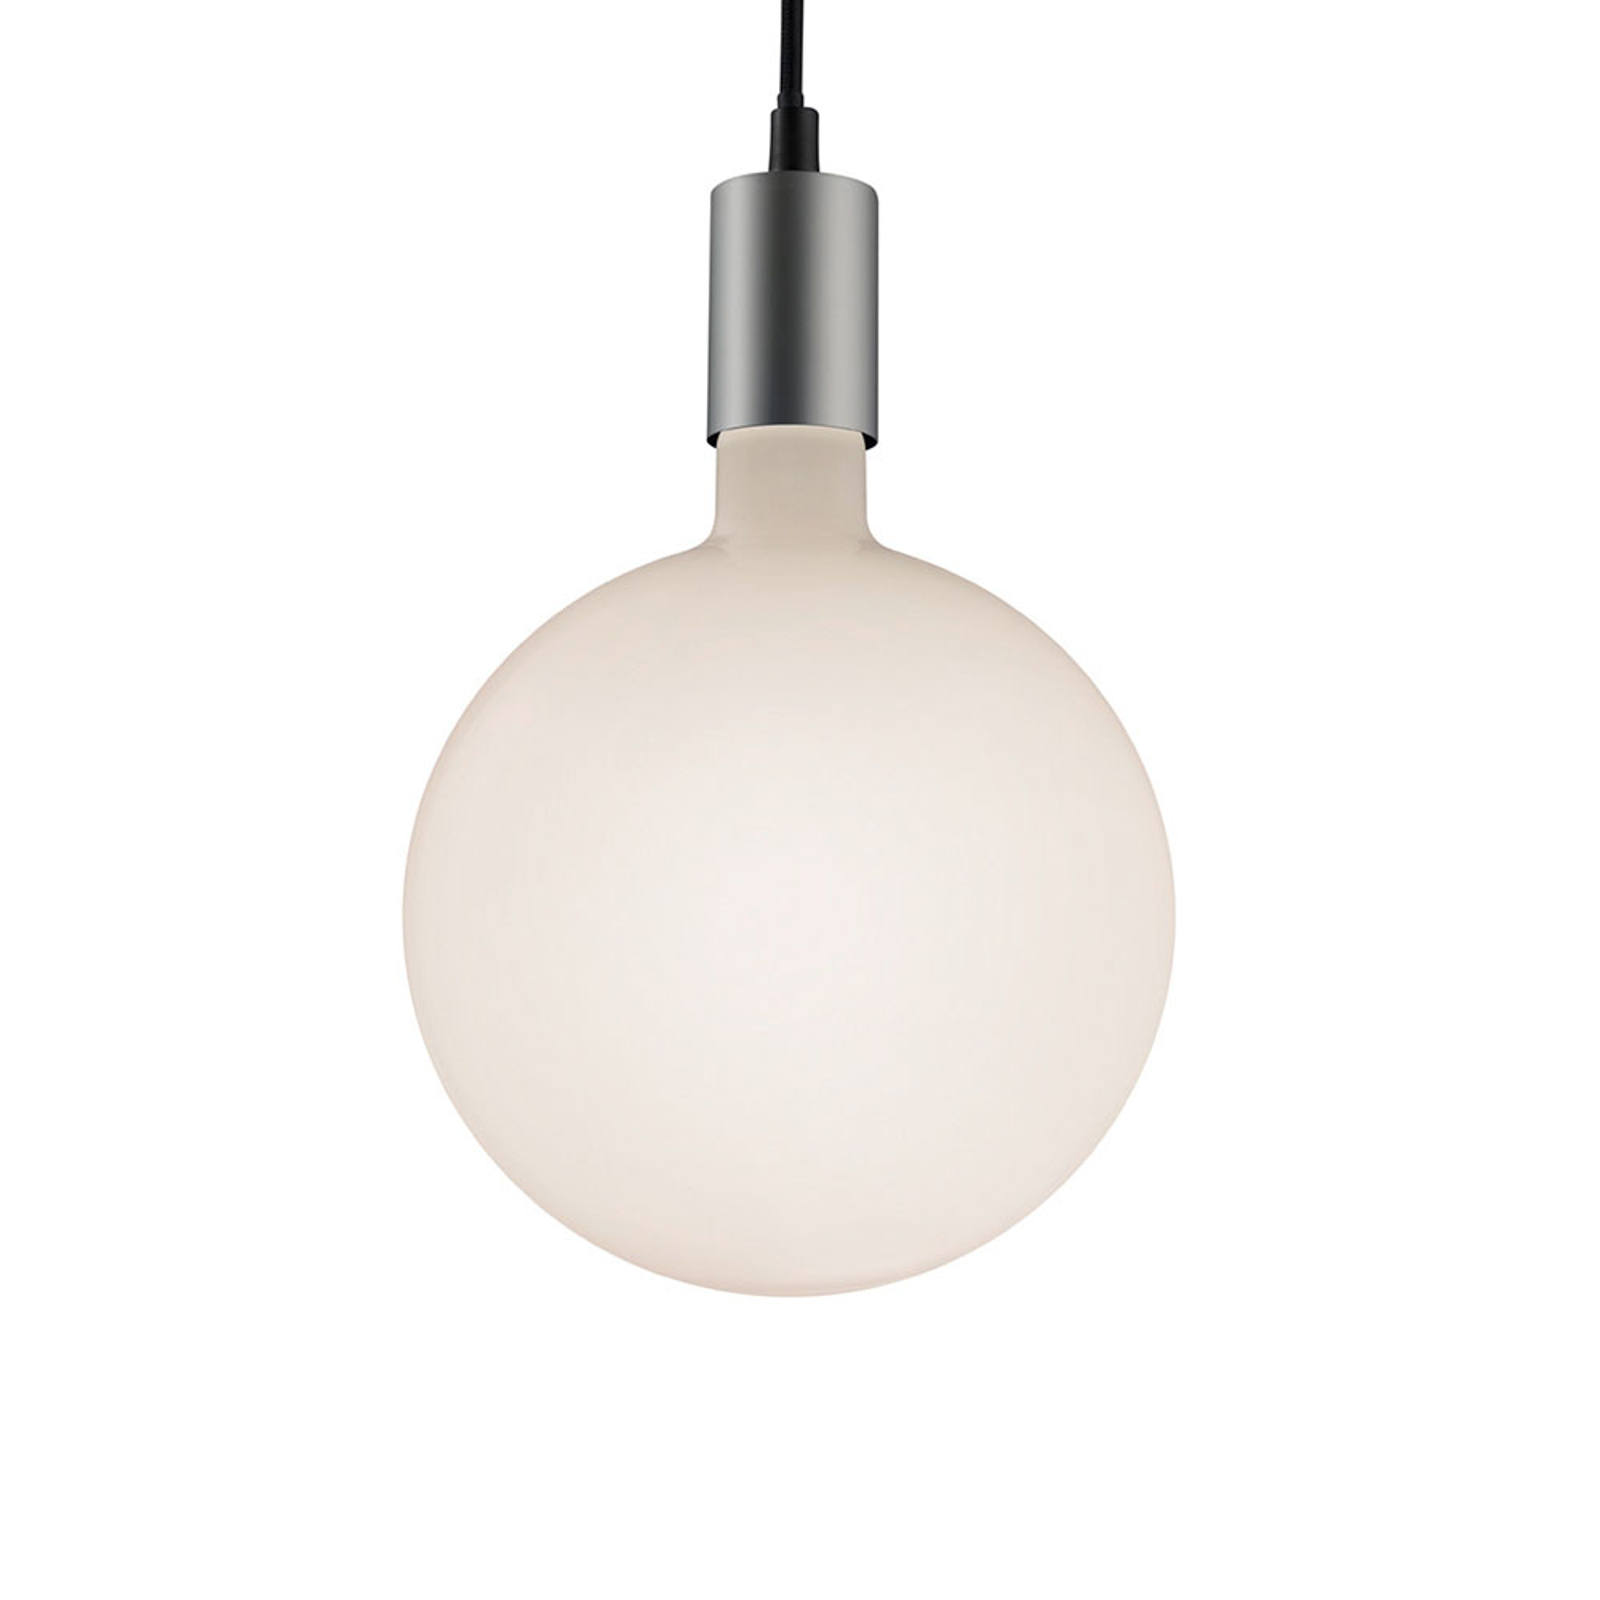 WiZ E27 LED-Globelampe 6,5W 650lm dimmbar CCT matt